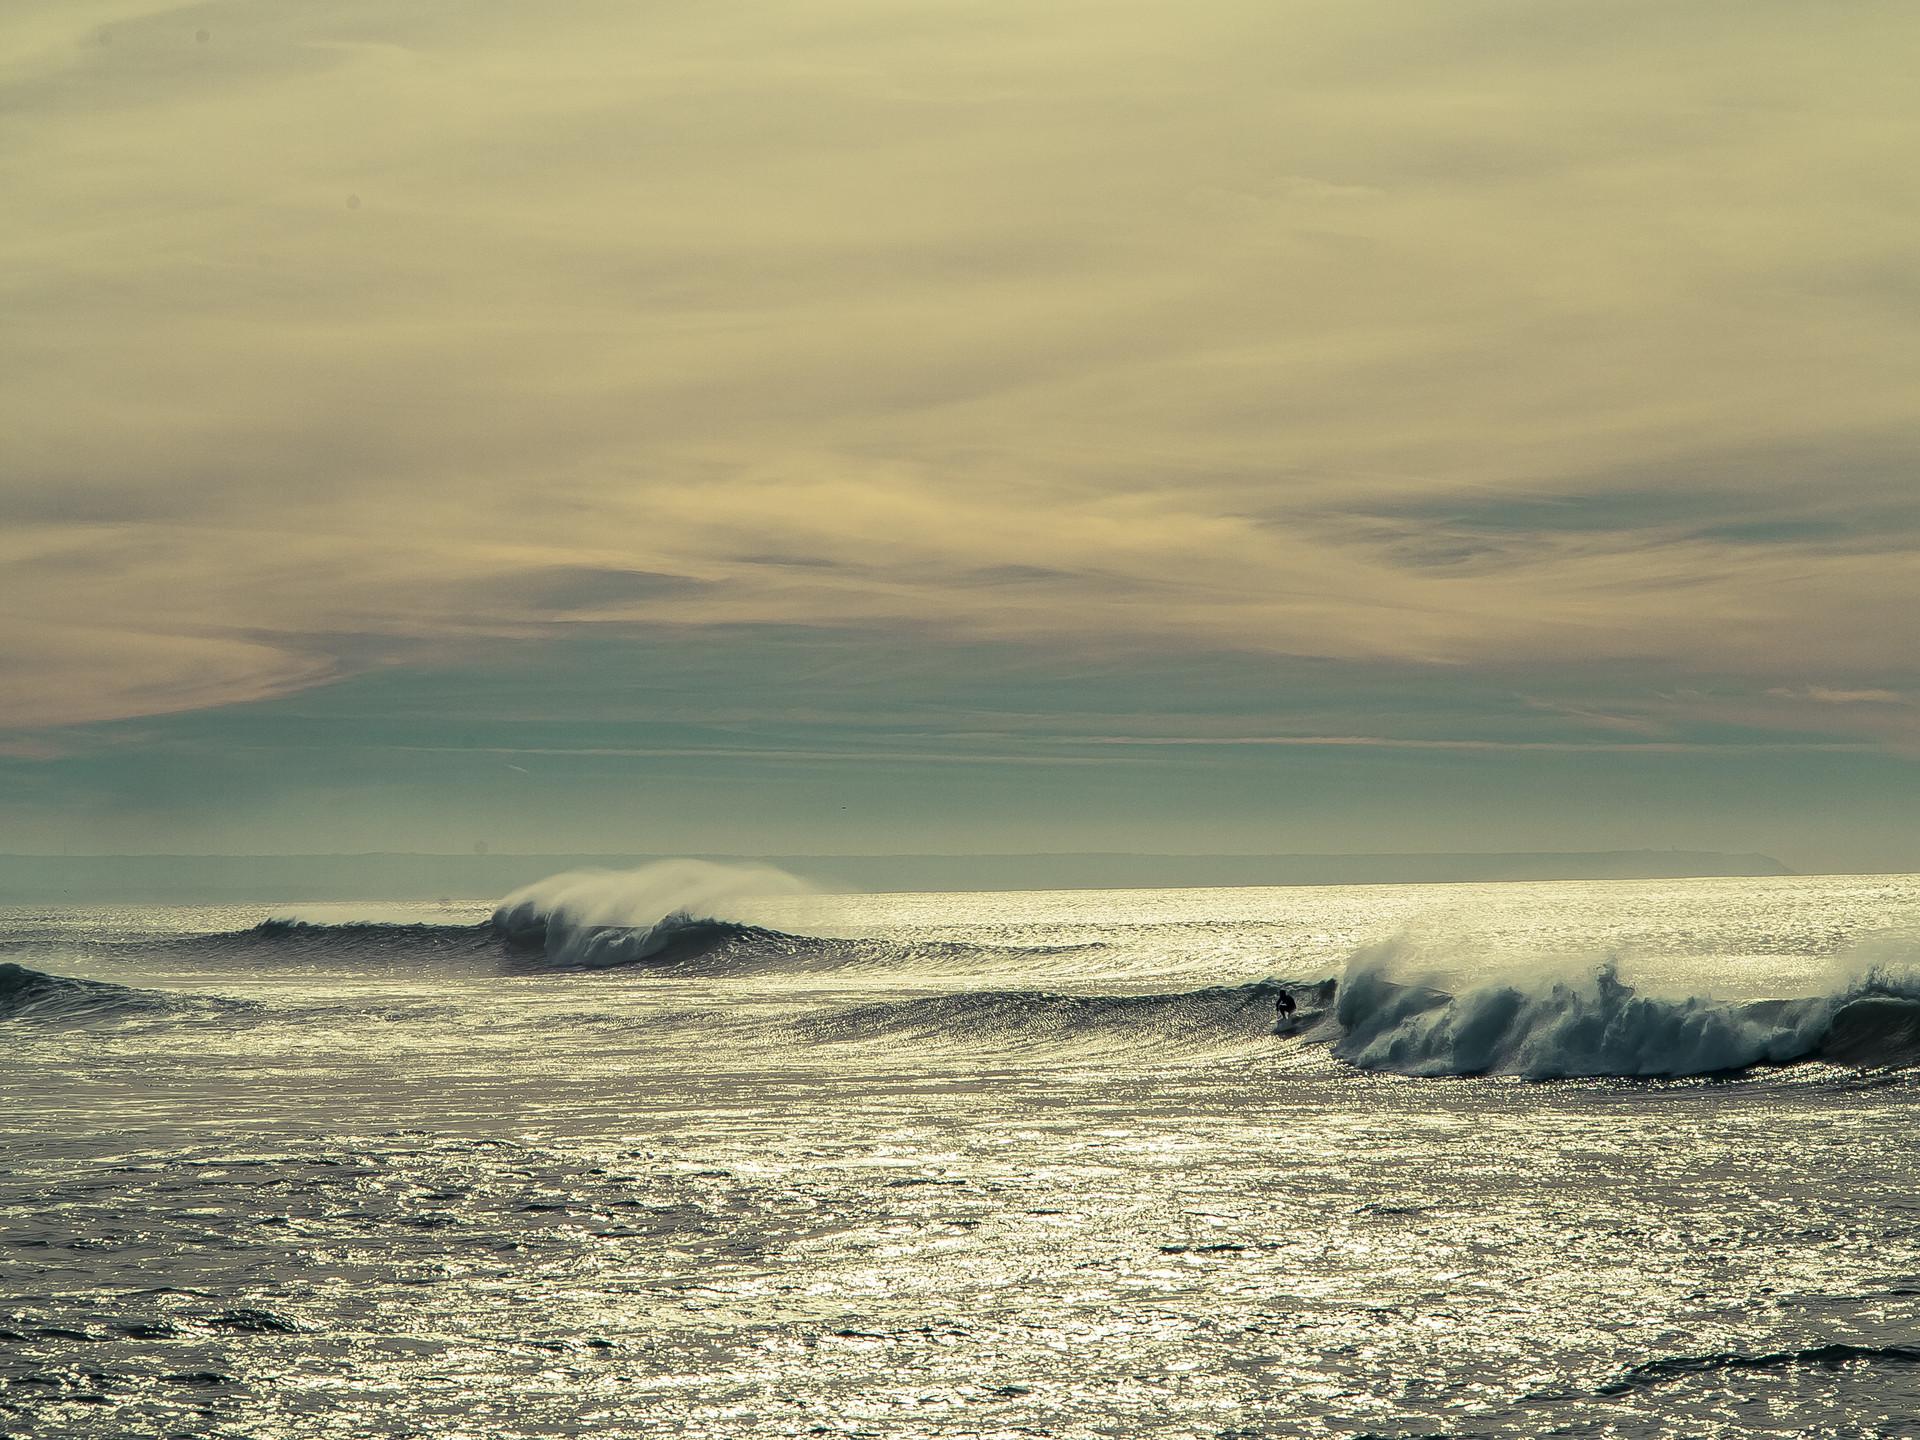 surfing-lisbon-ebb7db4dd9d78dabd2f0c963c